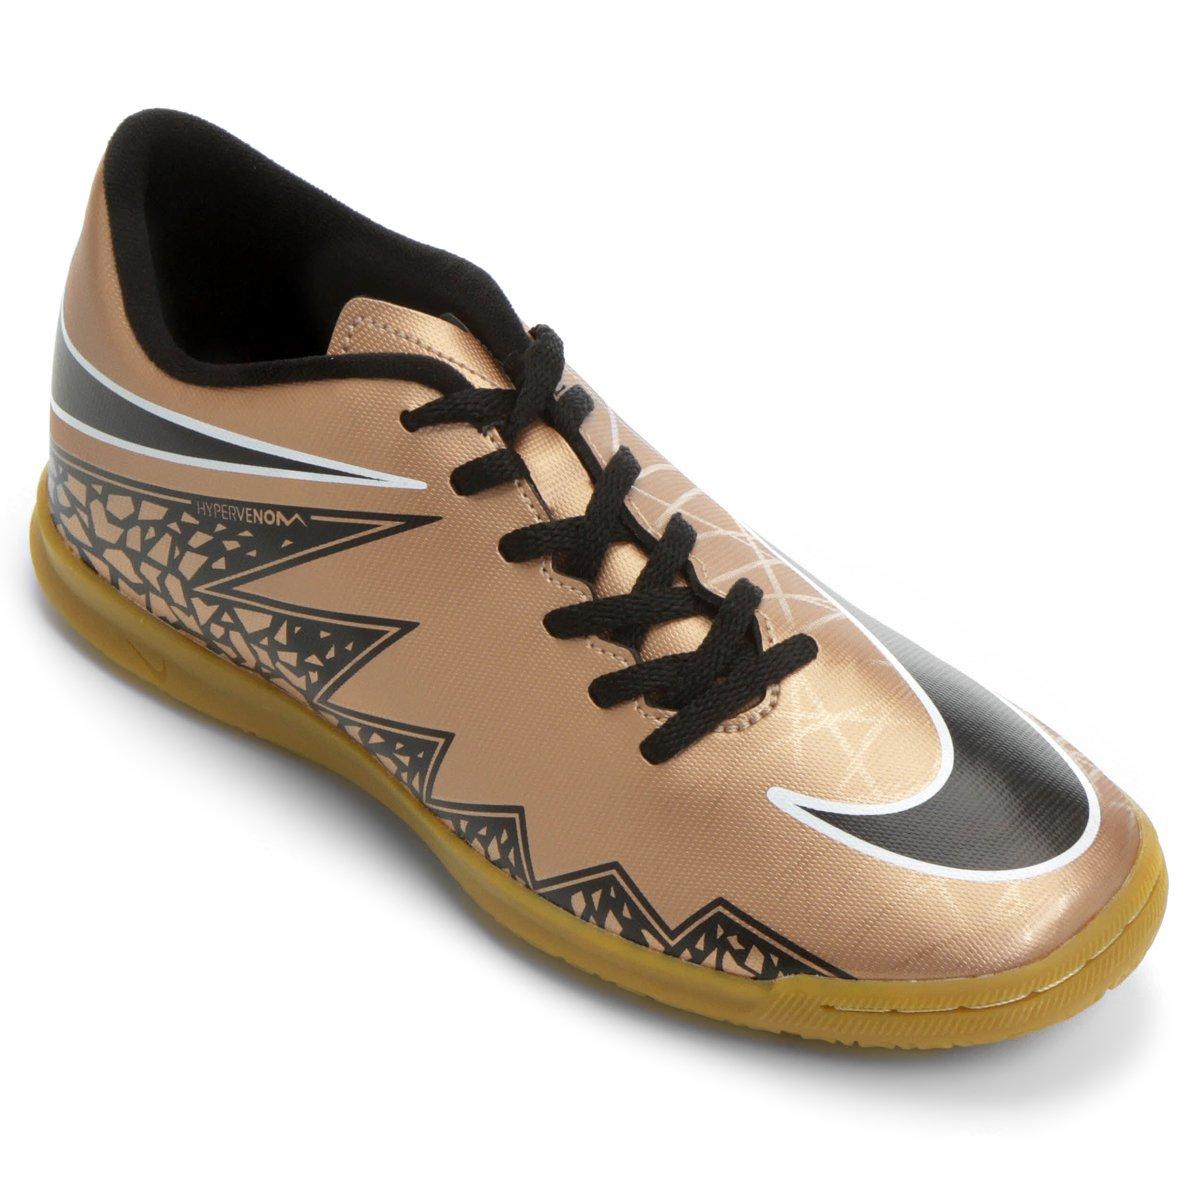 7191eb88d97 Chuteira Futsal Nike Hypervenom Phade 2 IC - Compre Agora